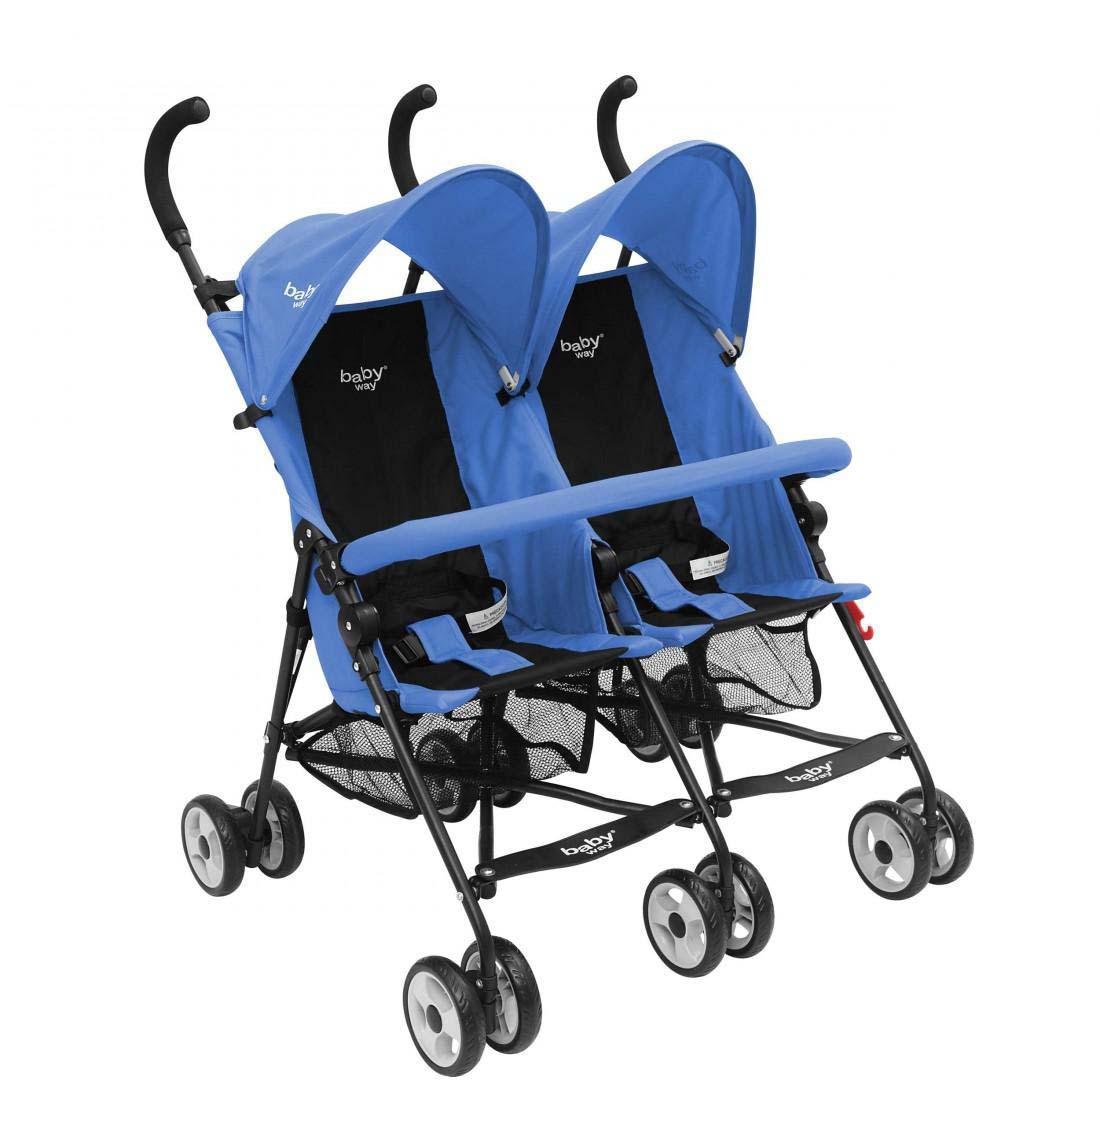 Coche Paragua Doble Baby Way Azul